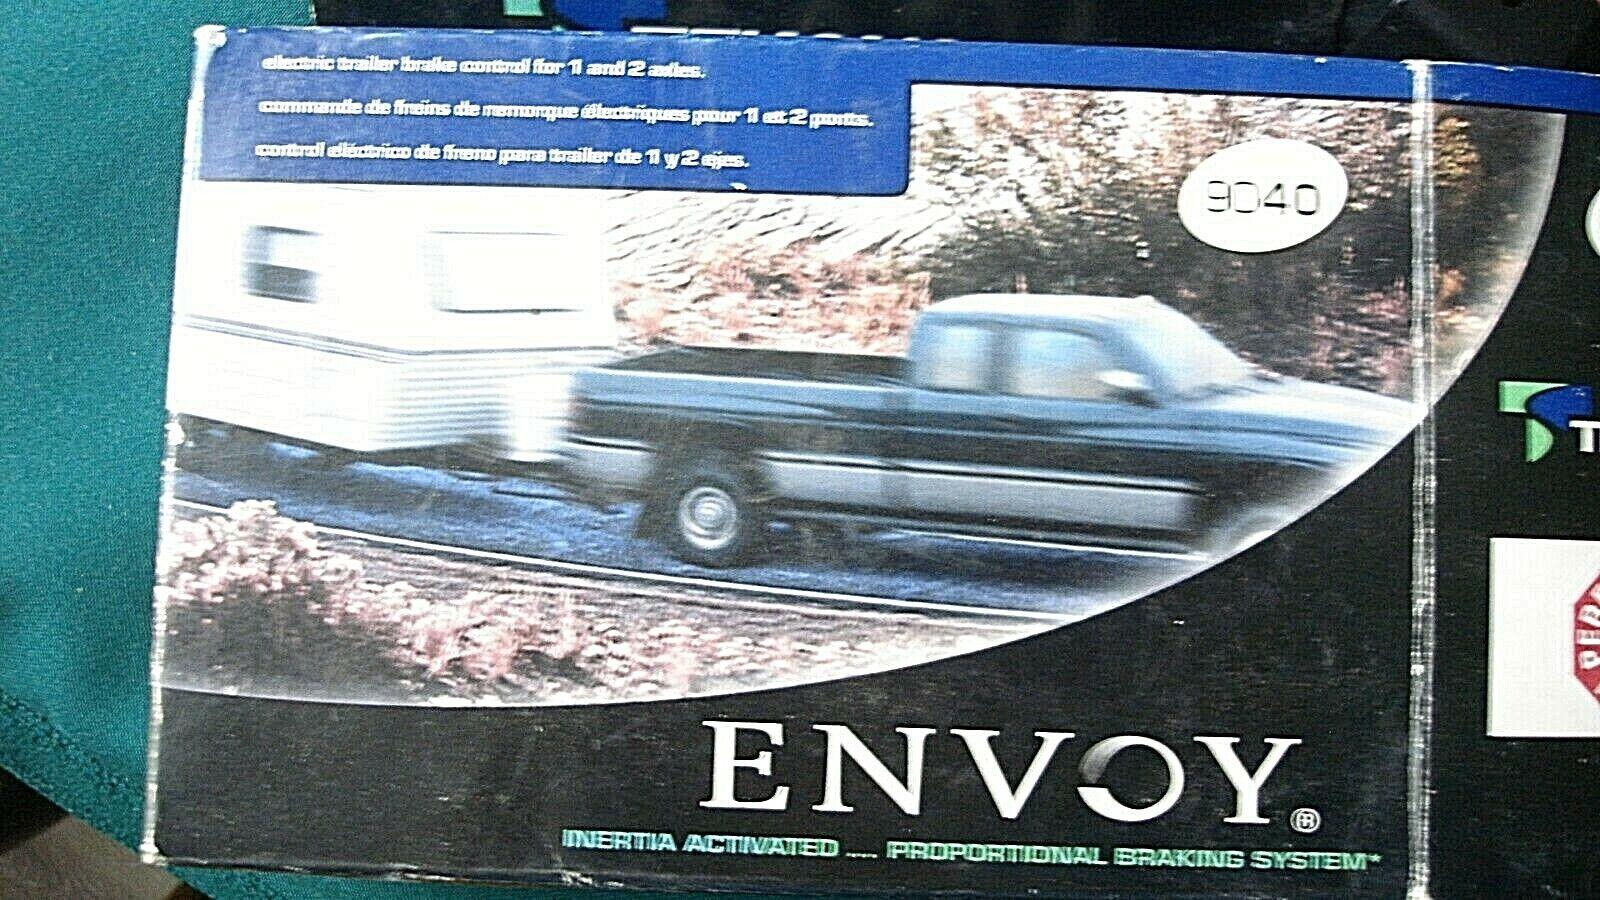 tekonsha envoy electric trailer brake control controller 9040 for sale online ebay tekonsha envoy electric trailer brake control controller 9040